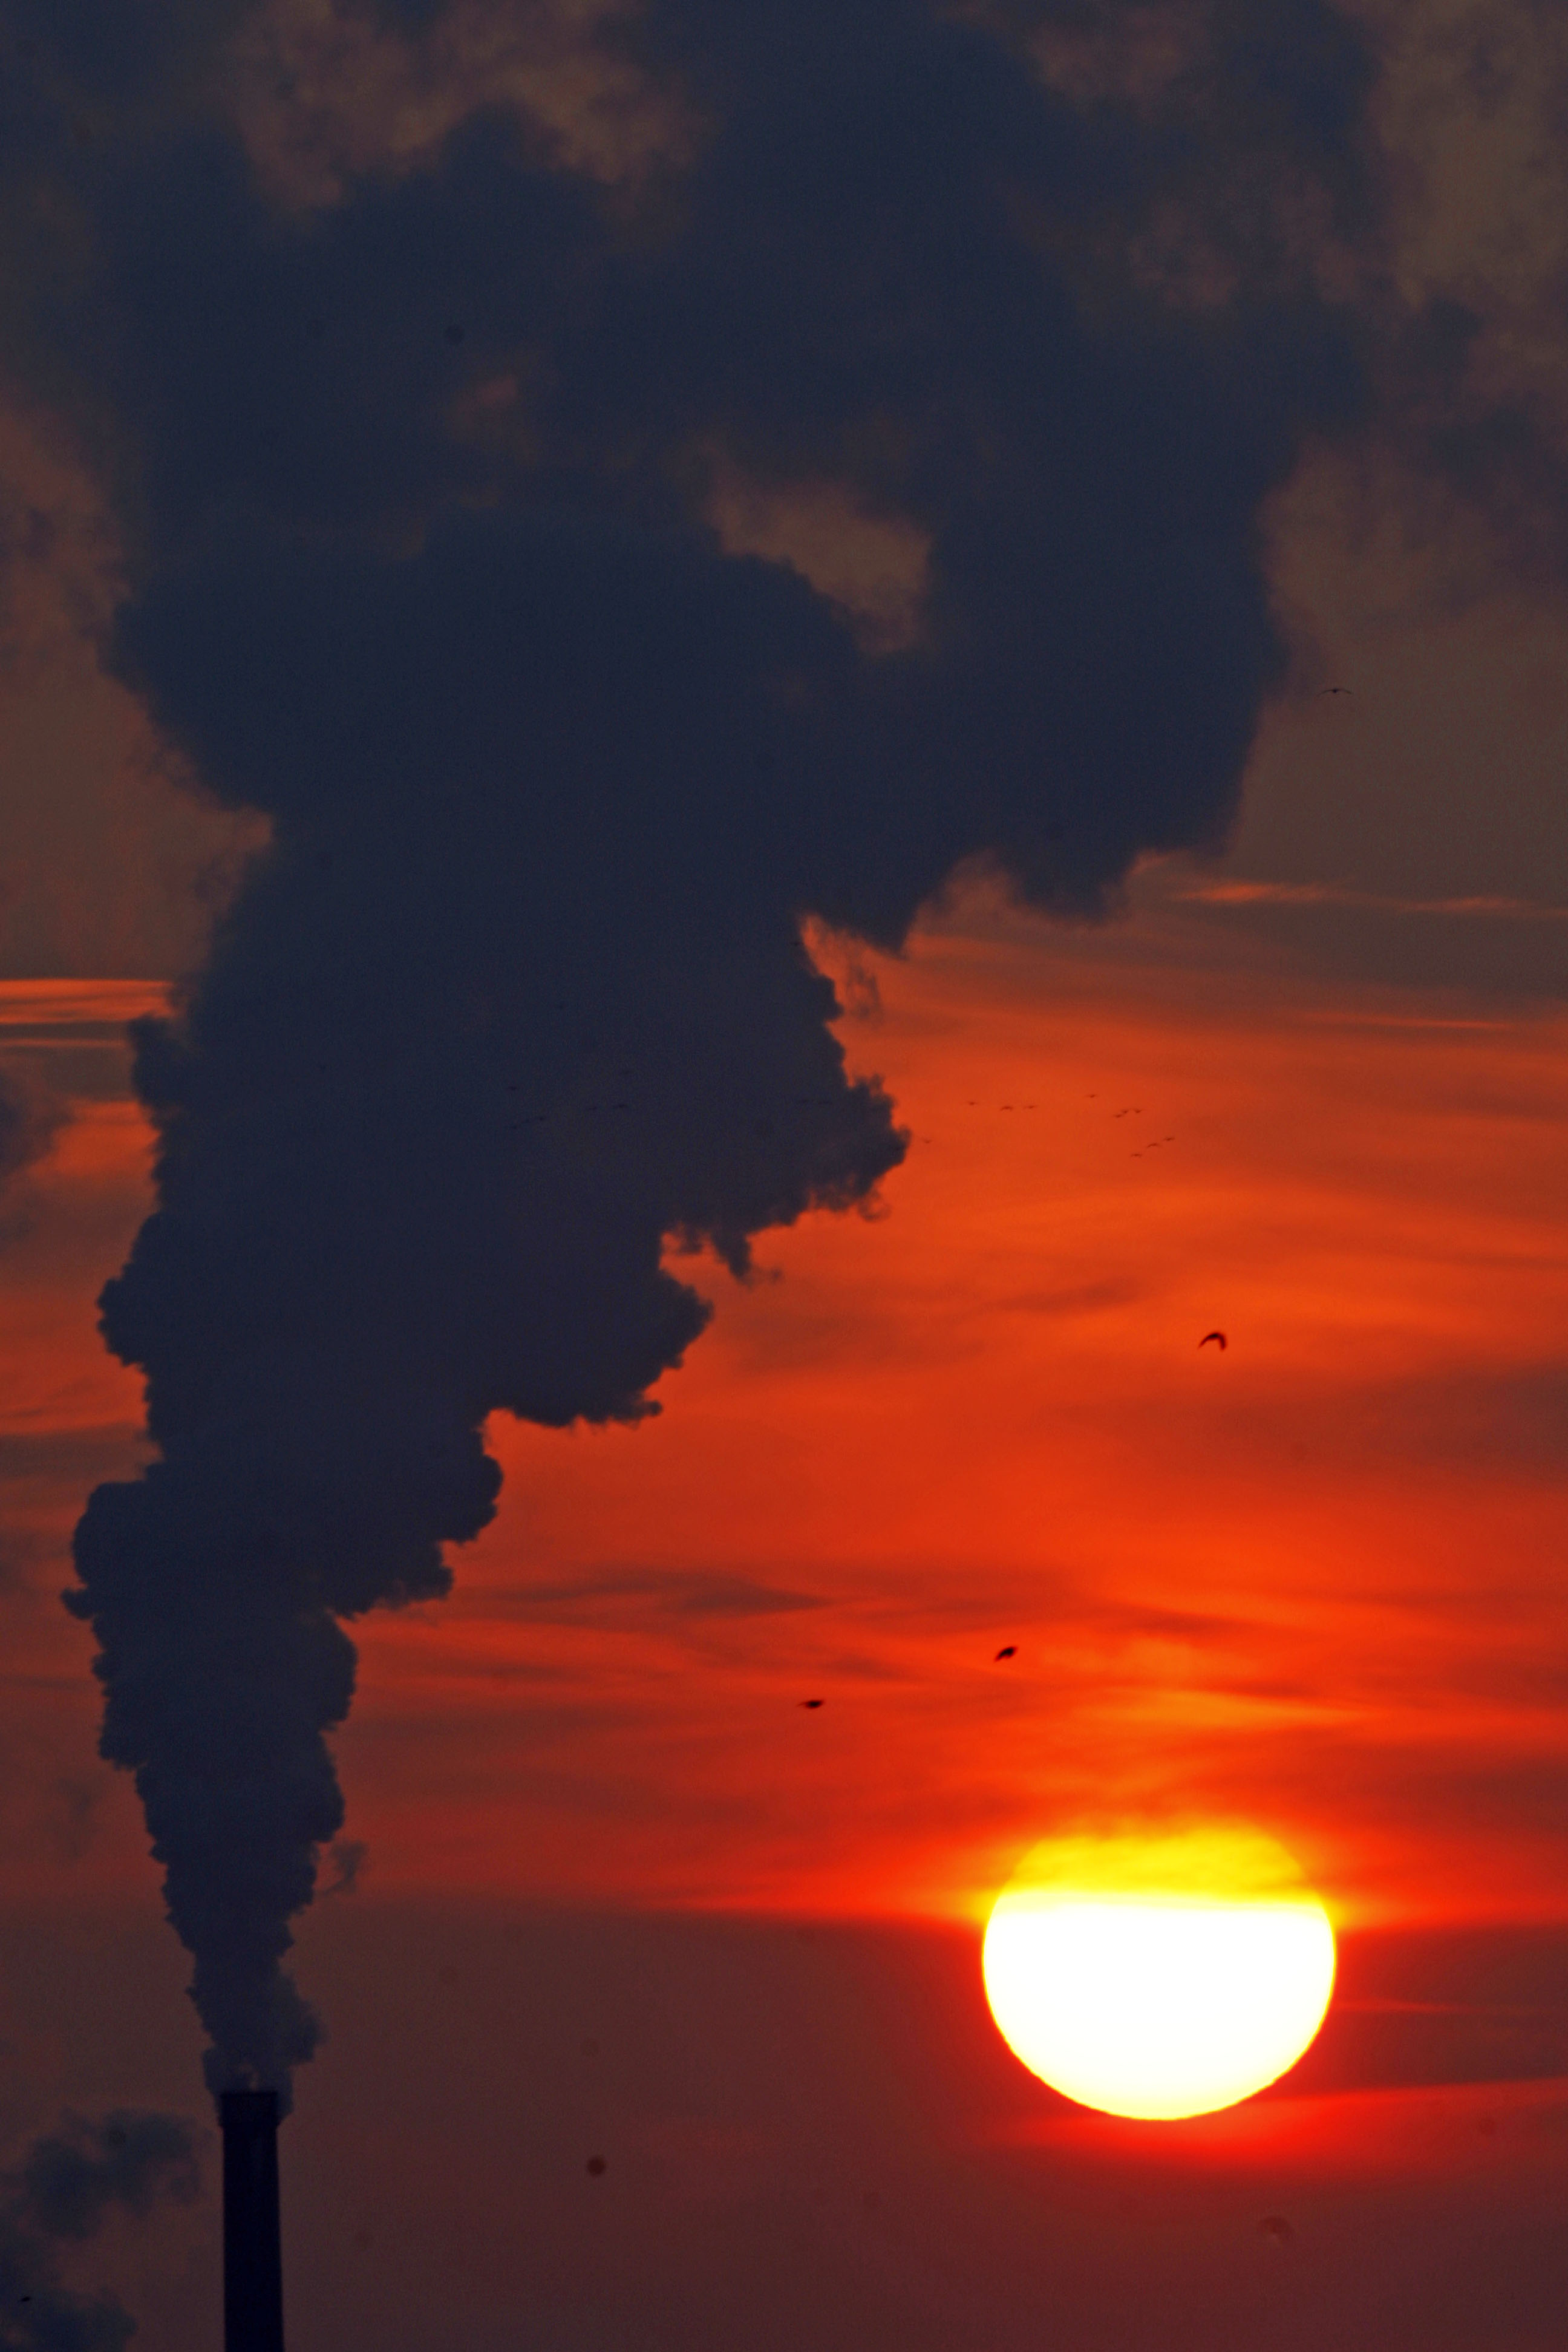 sunset #landscapephotography #smoke #romania #bucharest #coldday ...